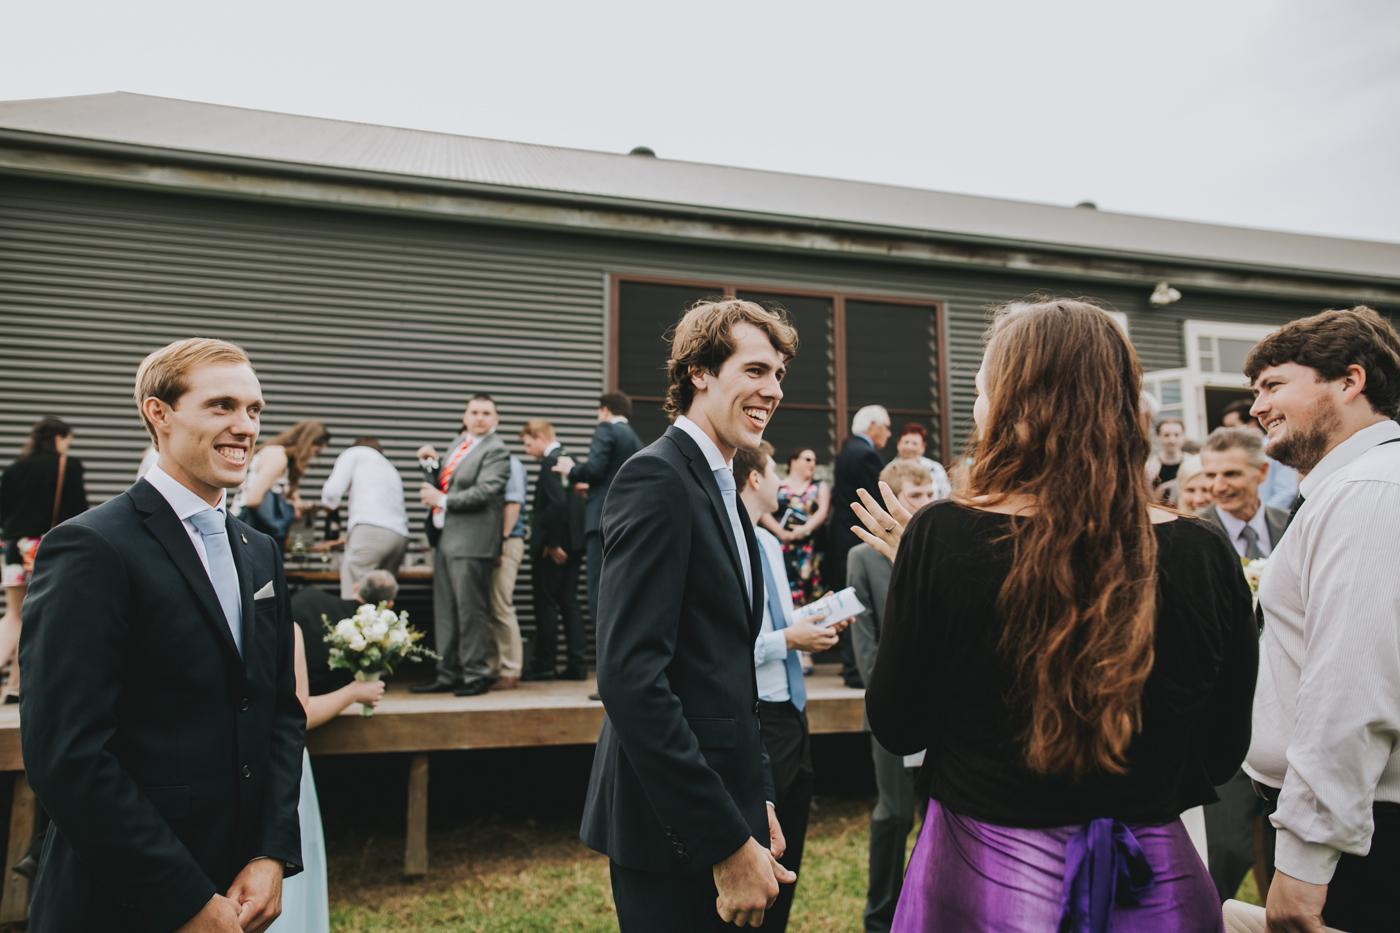 Rachel & Jacob - Willow Farm Berry - South Coast Wedding - Samantha Heather Photography-88.jpg